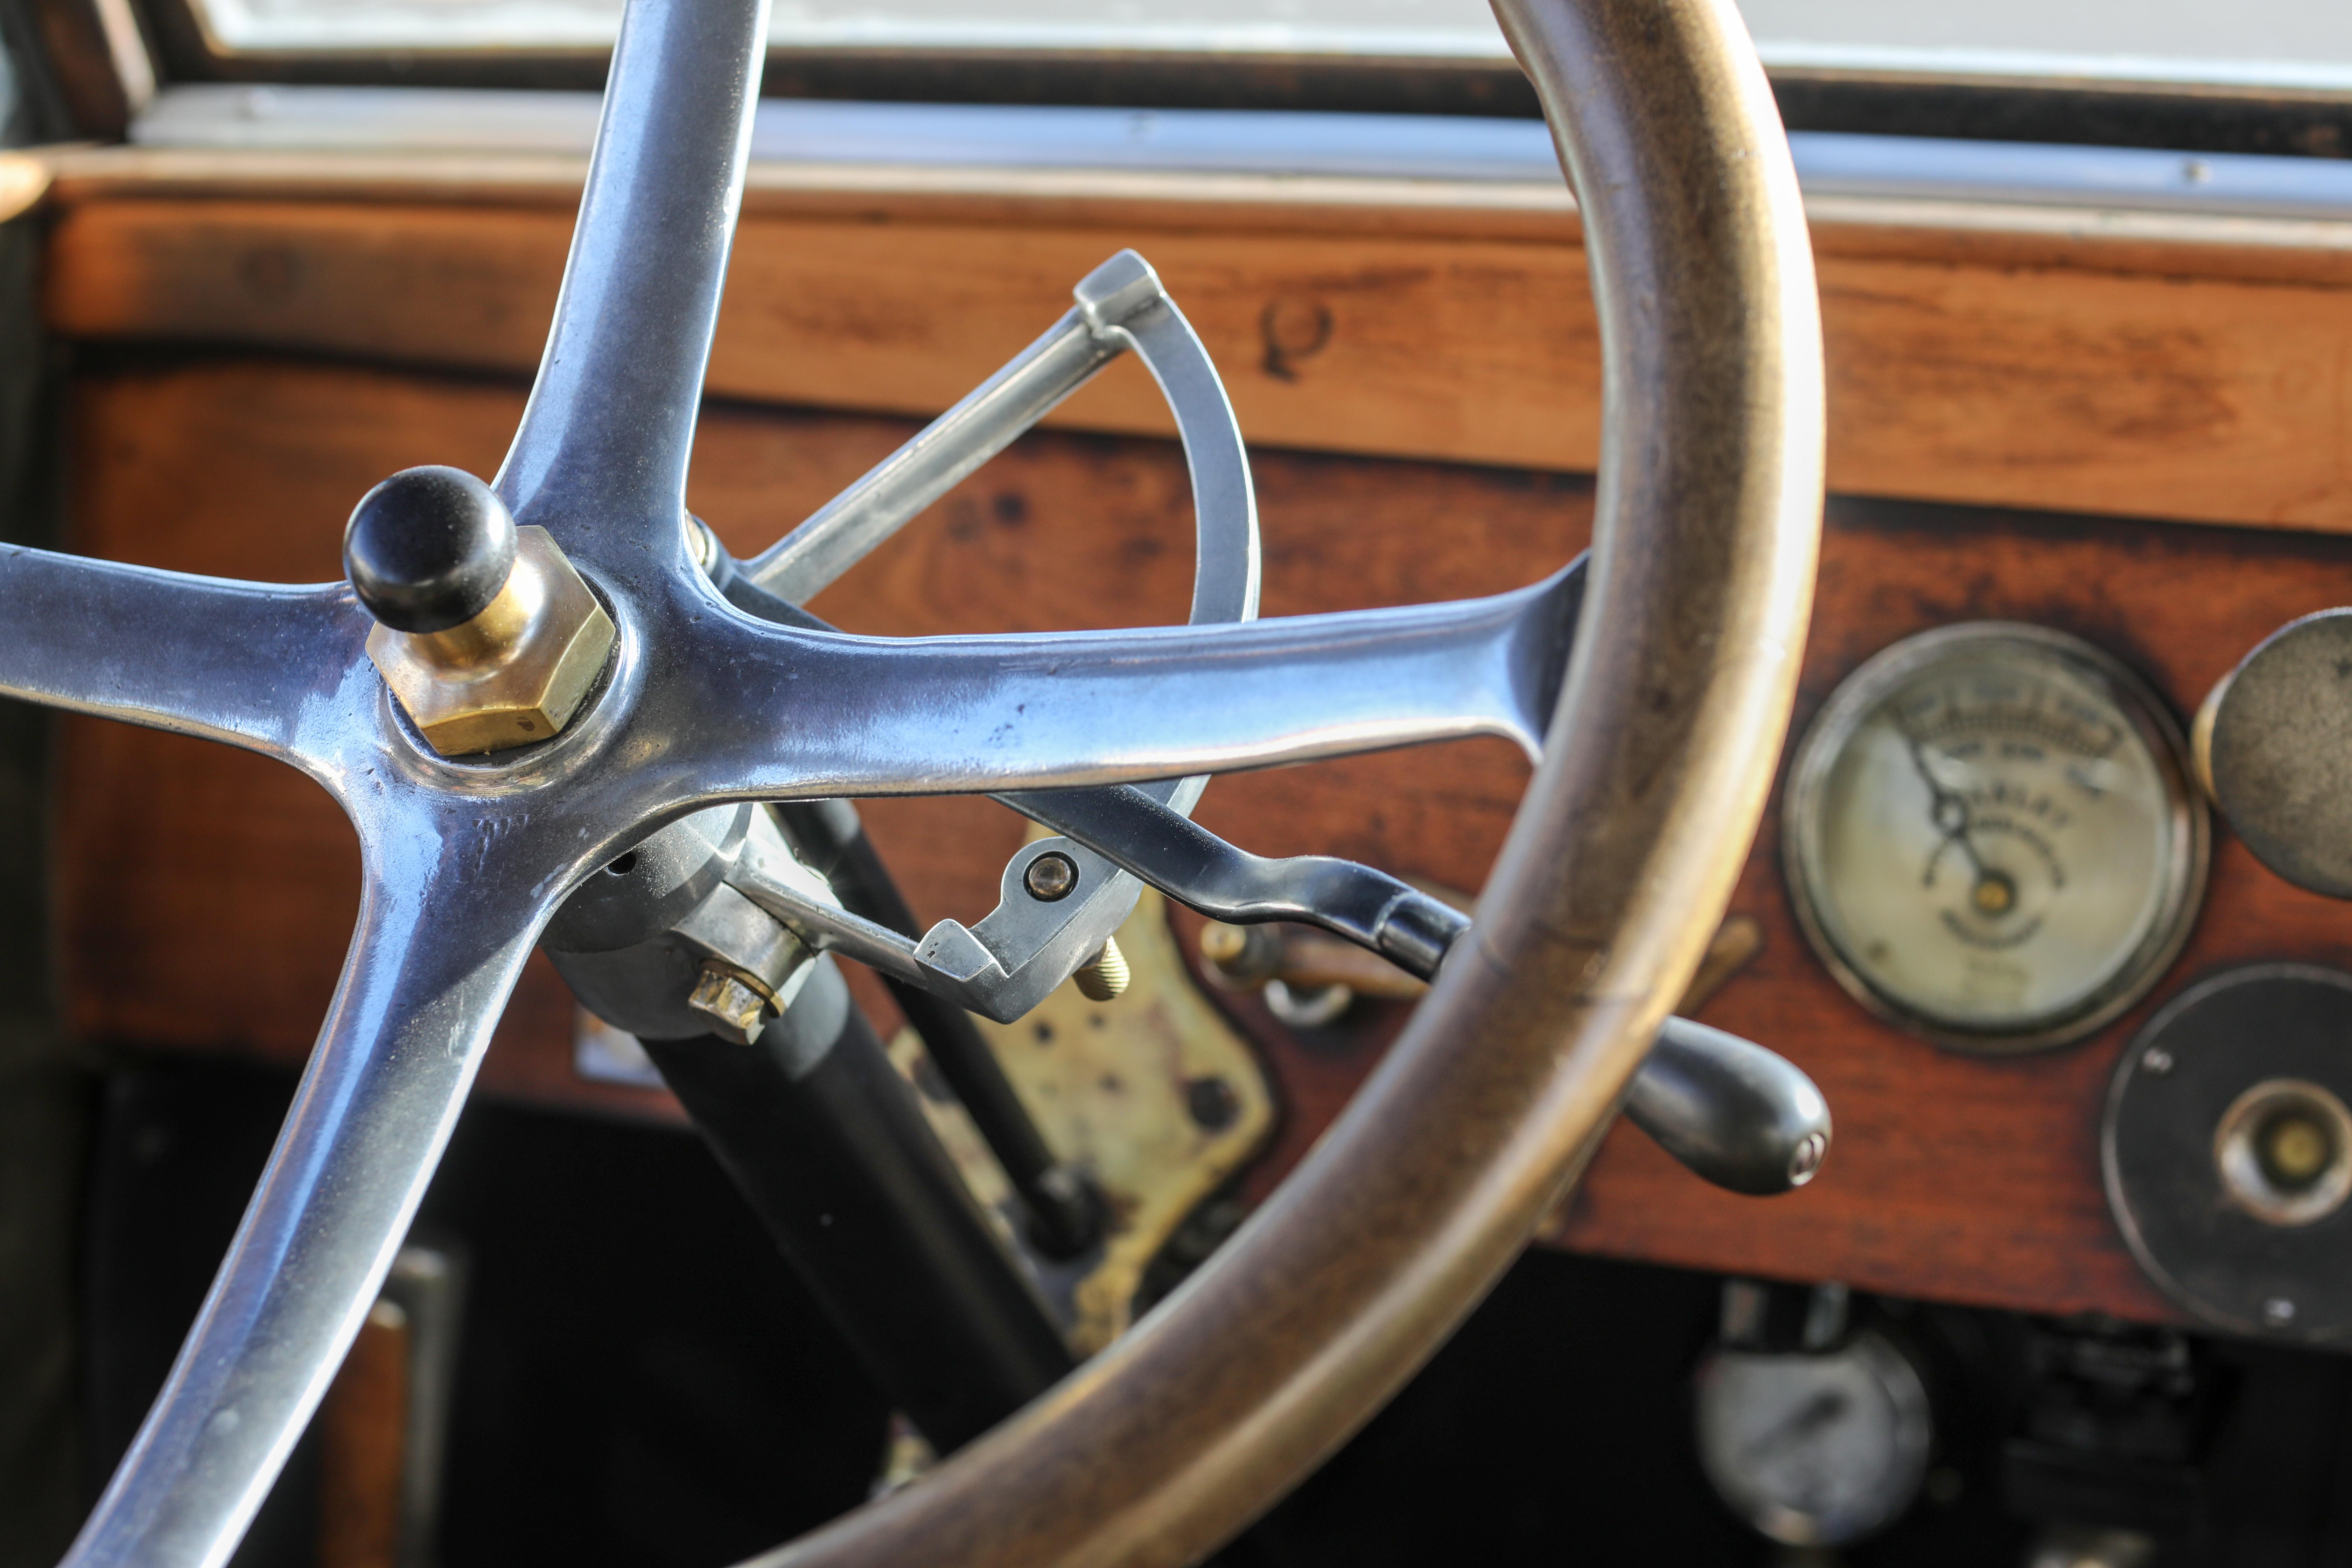 Stylisches Interieur Holz Lenkrad Stanley Steamer 735d (1919) - Dampfauto - Steam Car - Oldtimer mieten Fotoshooting